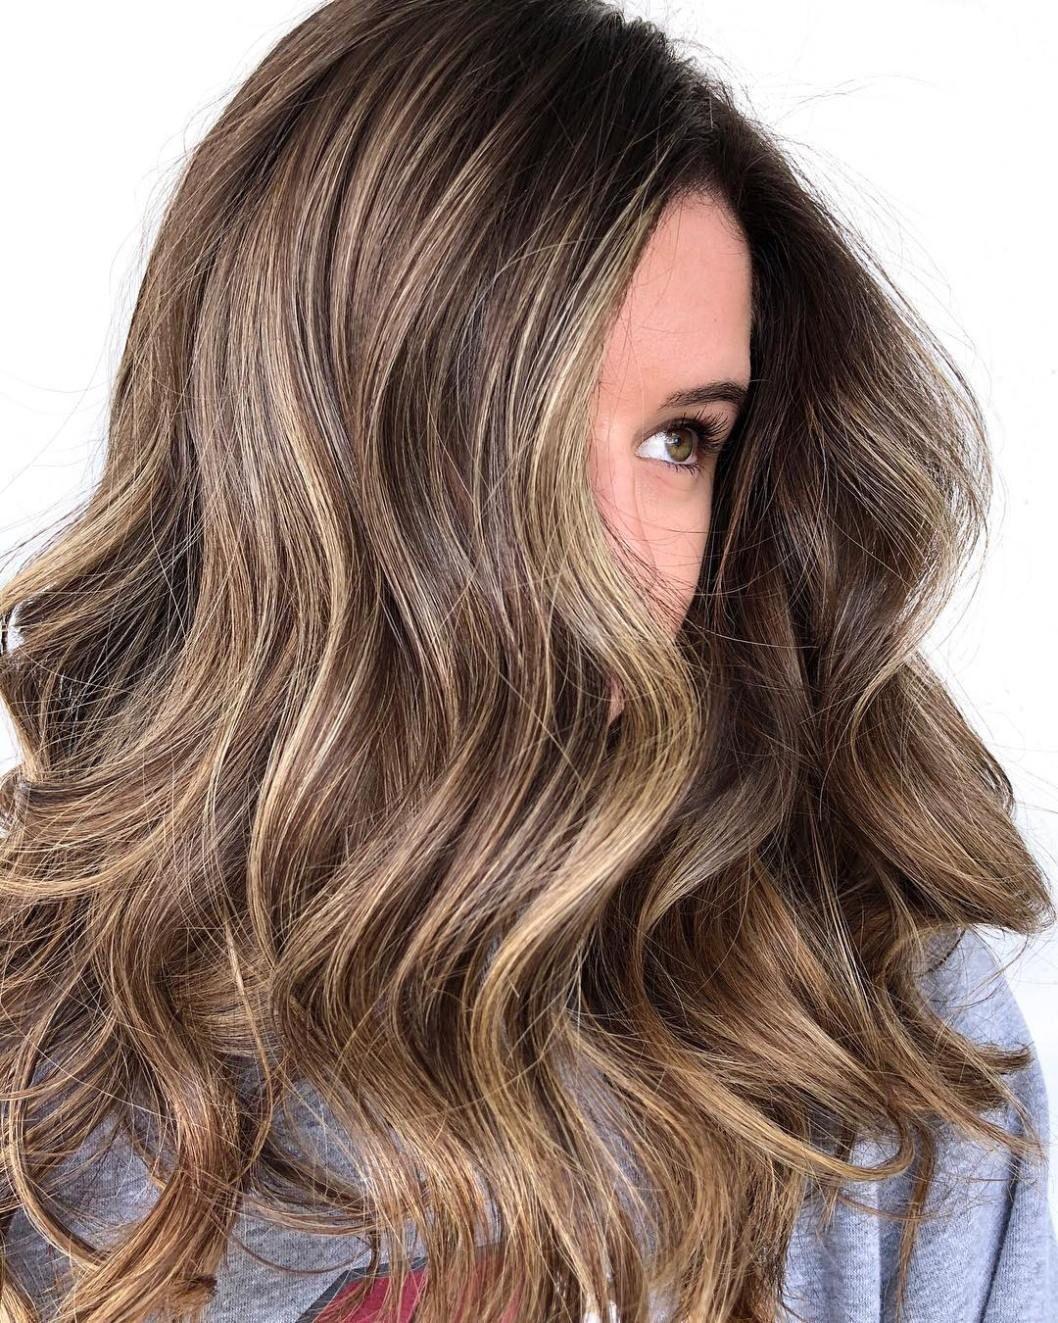 What Is The Best Hair Color For Hazel Eyes Dark Hair Dye Perfect Hair Color Caramel Hair Dye